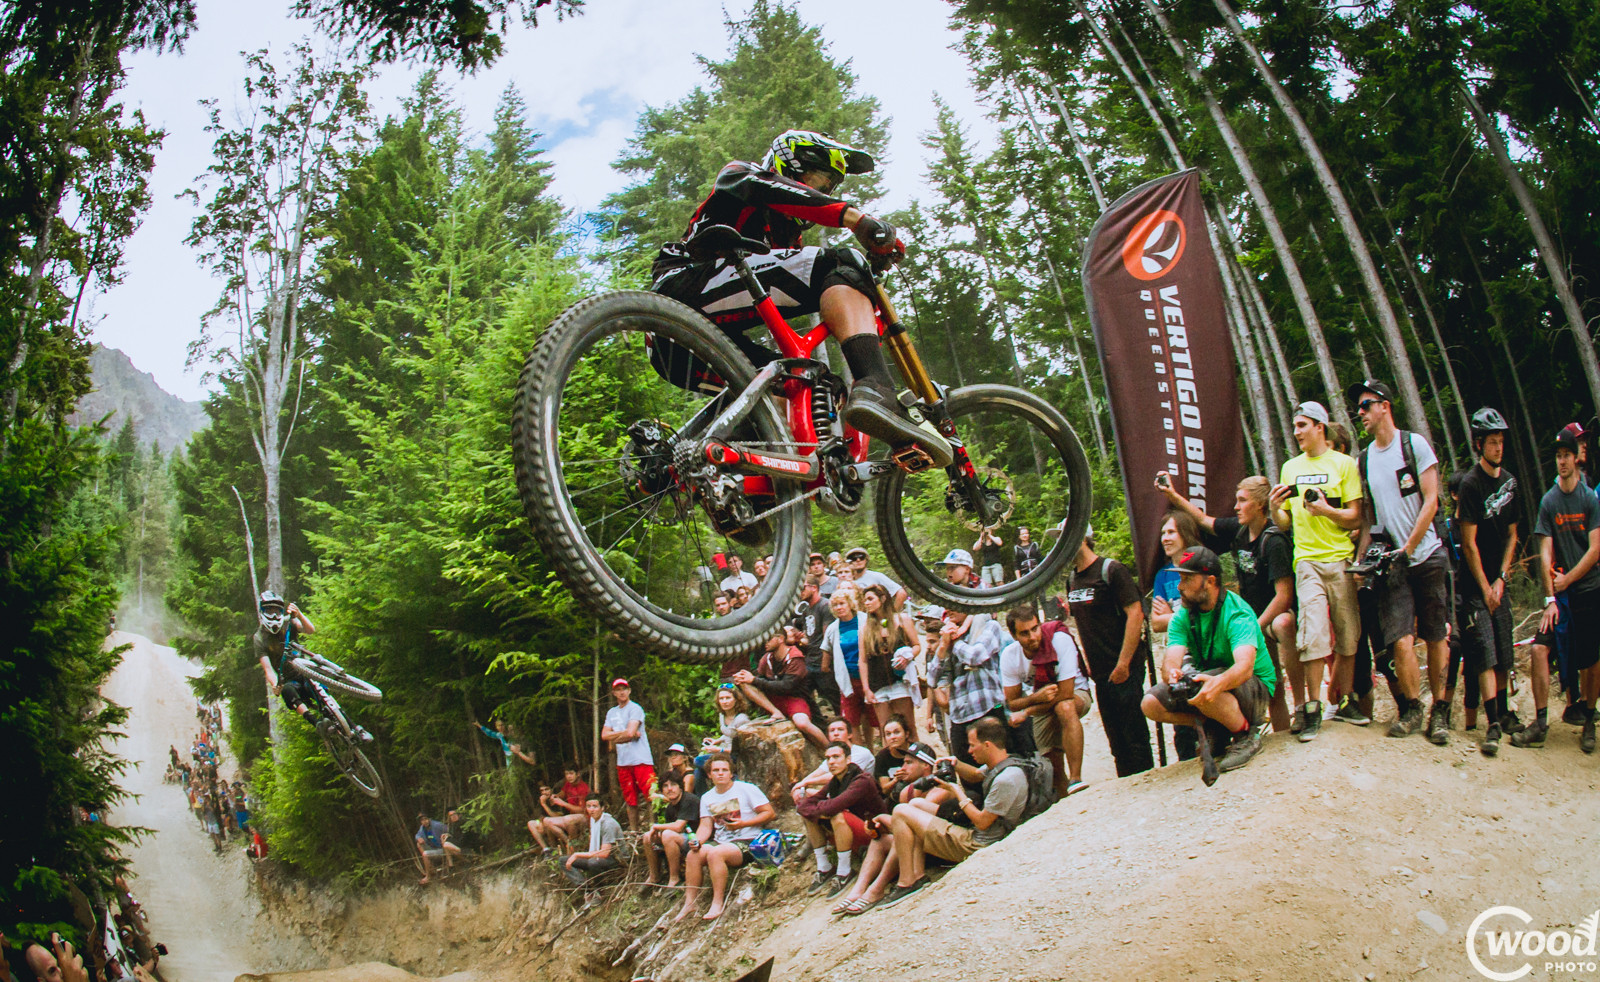 Greg Williamson - Vertigo Bikes Whip Off at the Atlas Bar Wynyard Jam - Mountain Biking Pictures - Vital MTB